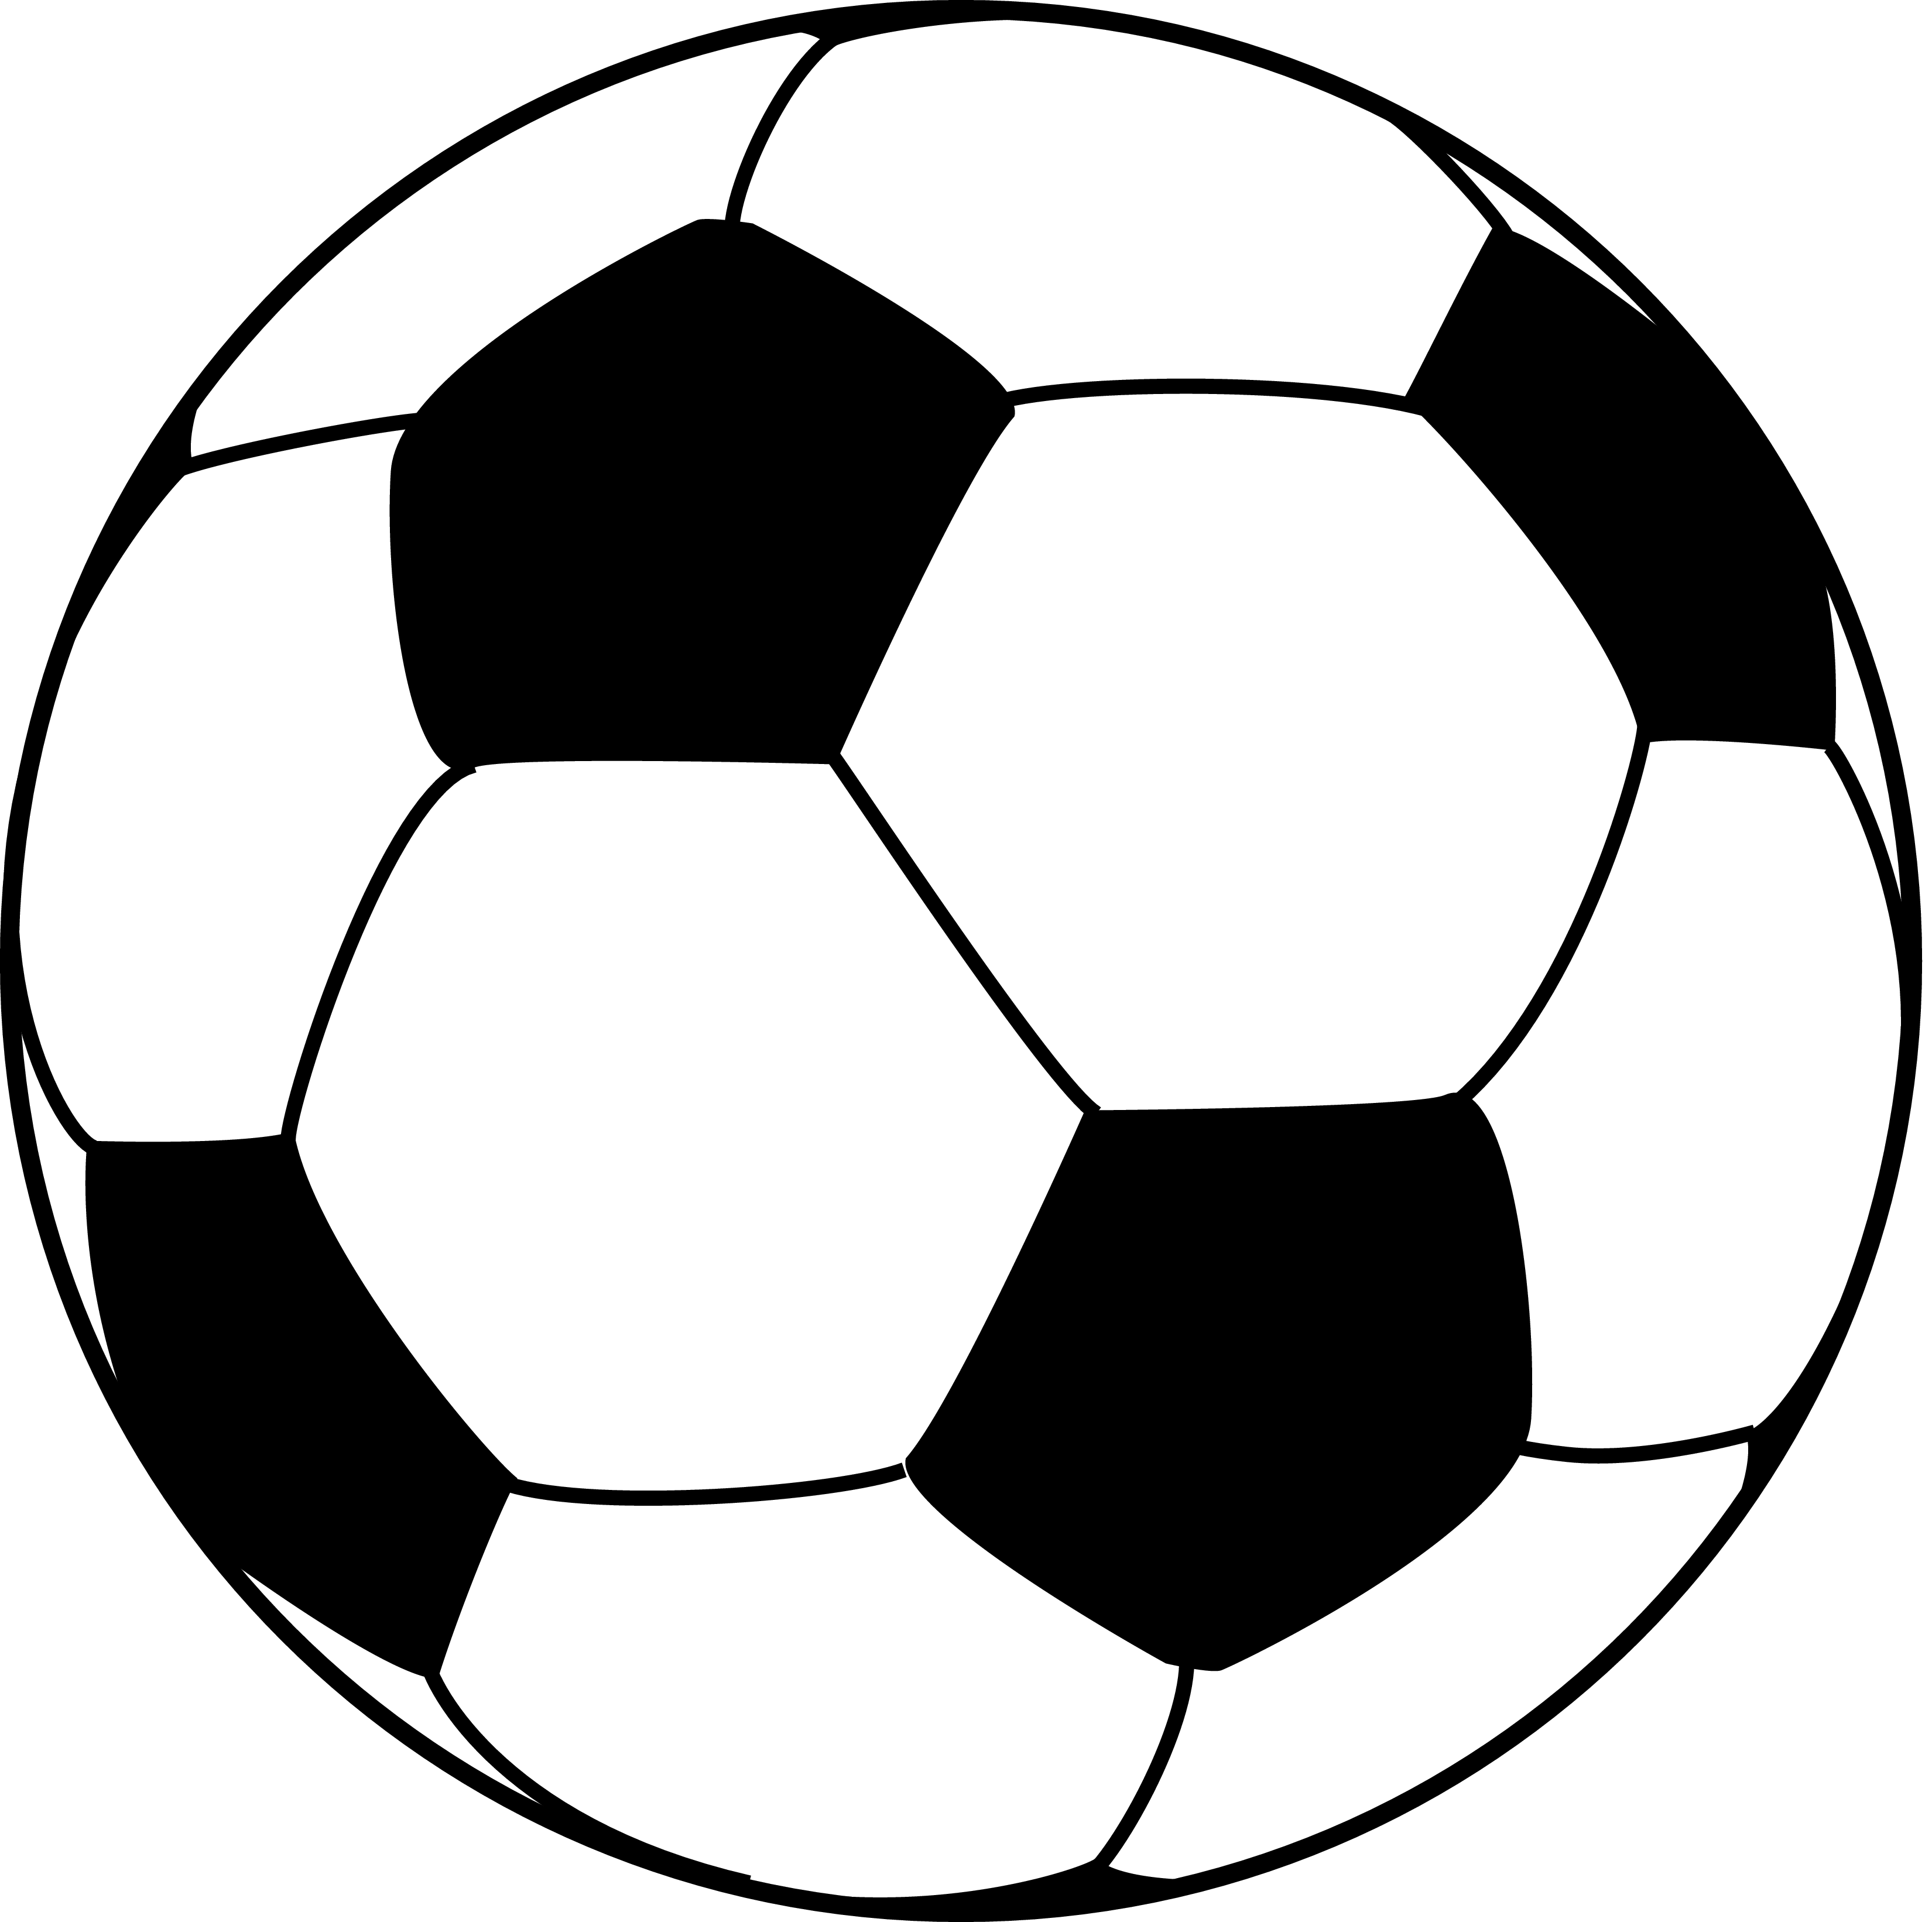 Soccer Ball PNG Transparent Image.